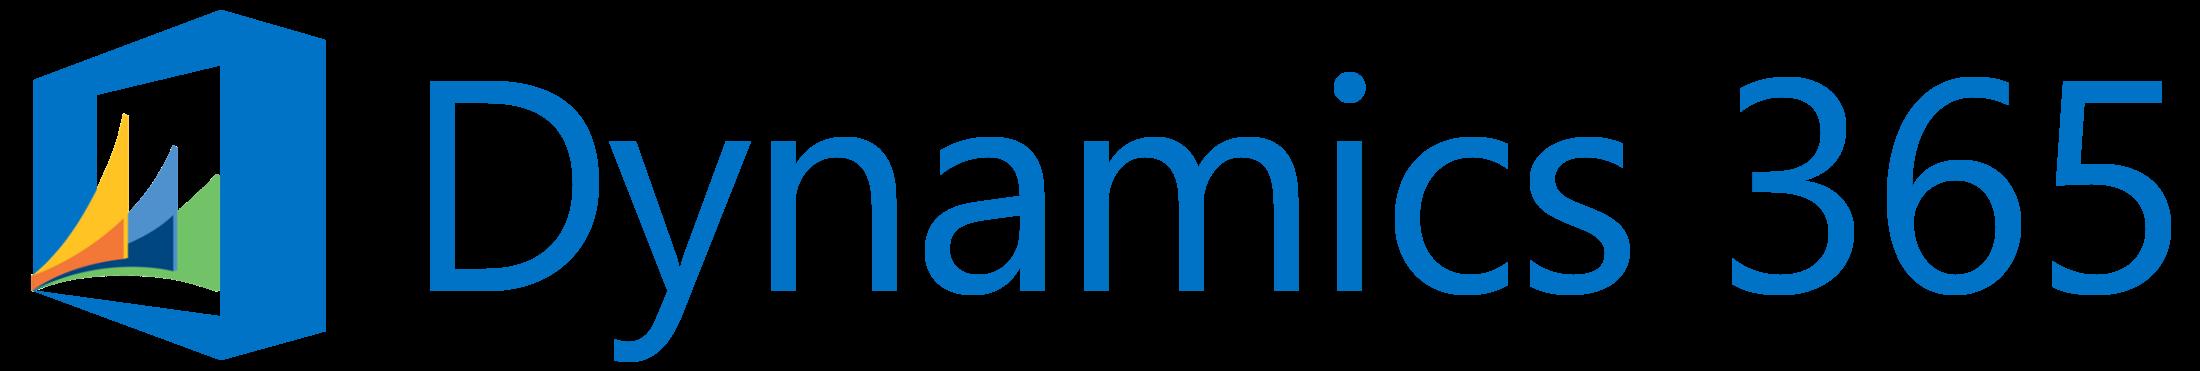 dynnamics-365-logo-custom - Technology Management Concepts Netsuite Logo Transparent